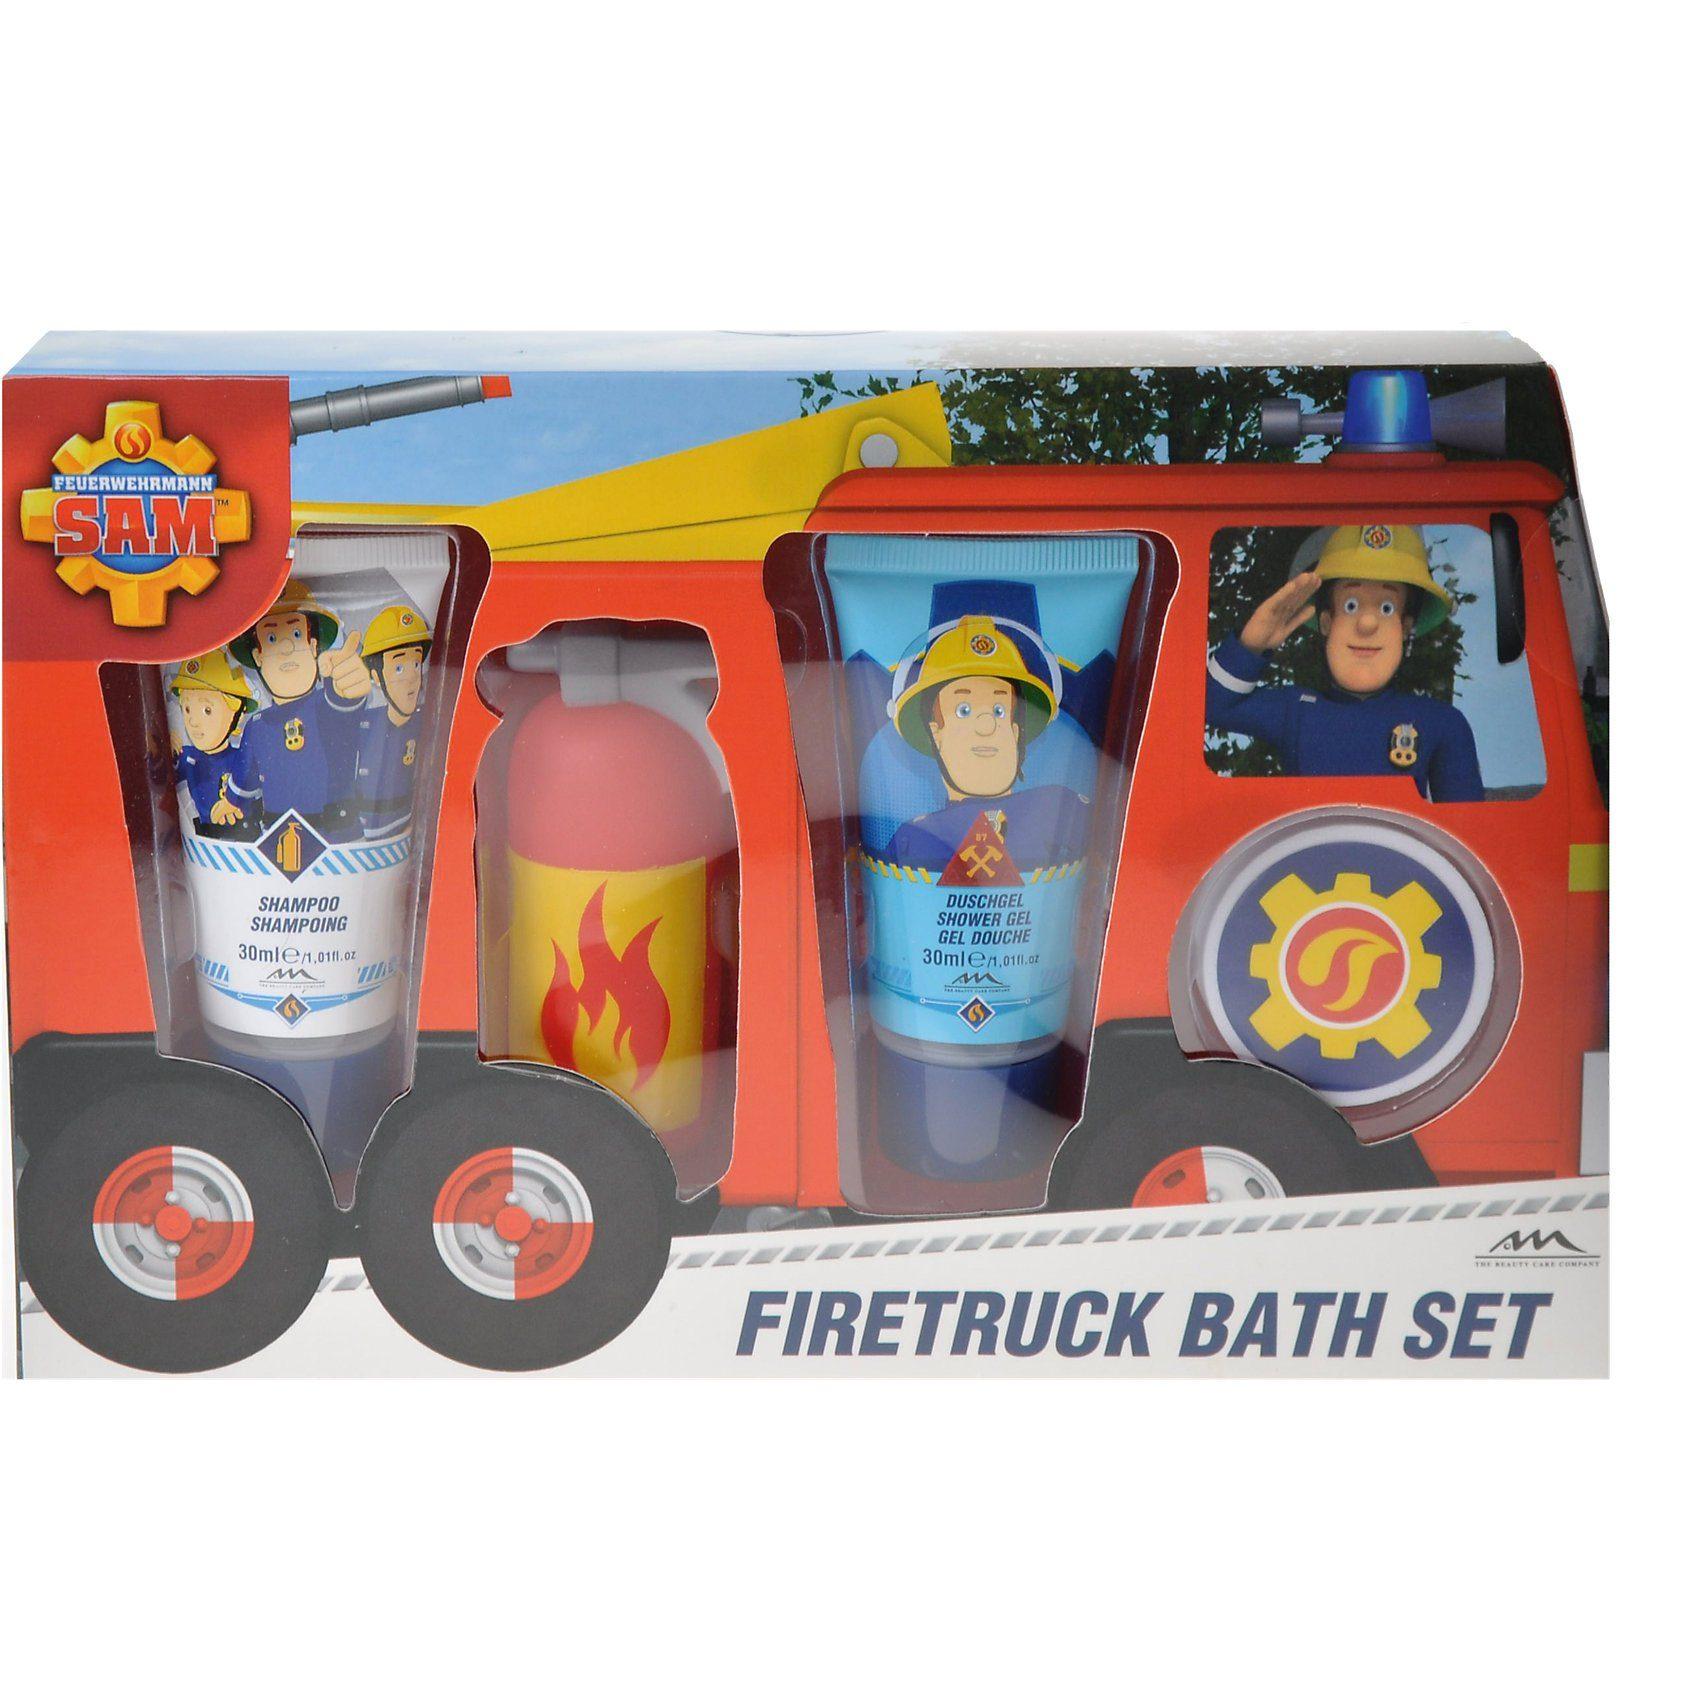 Badeset Feuerwehrmann Sam, 4-tlg.